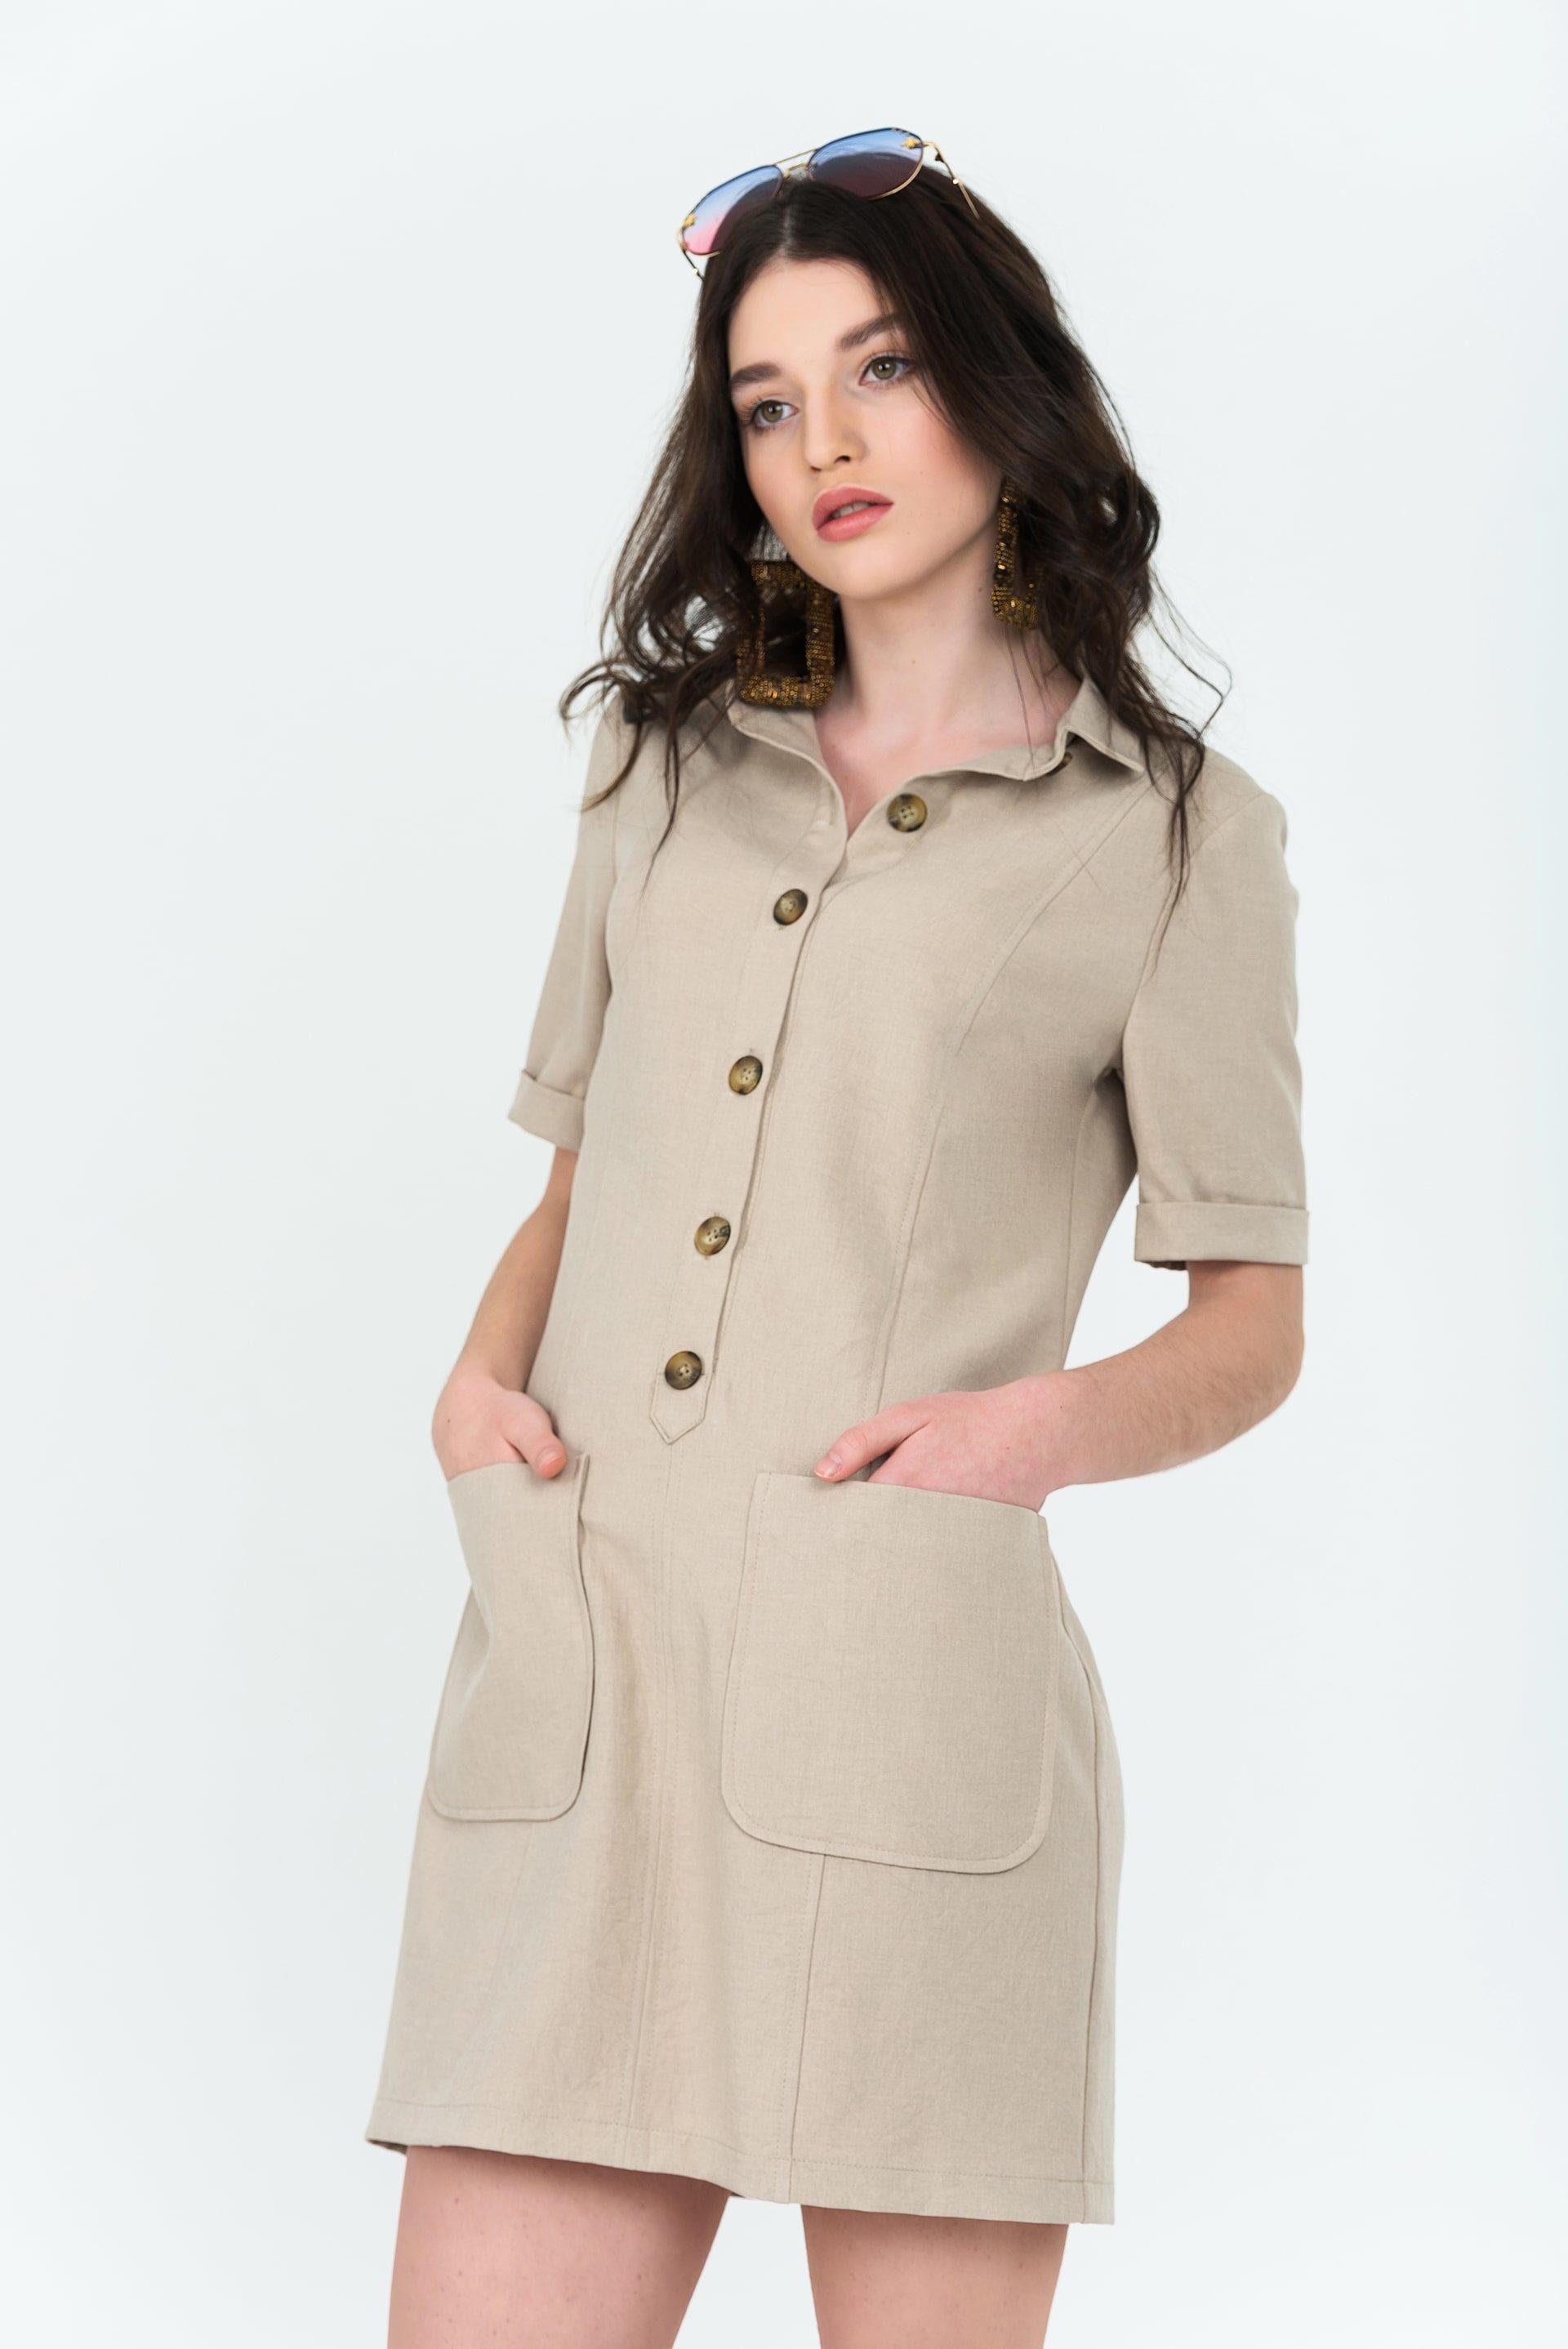 161c0cb8a9d Женская одежда ANNALIZA от Российского производителя